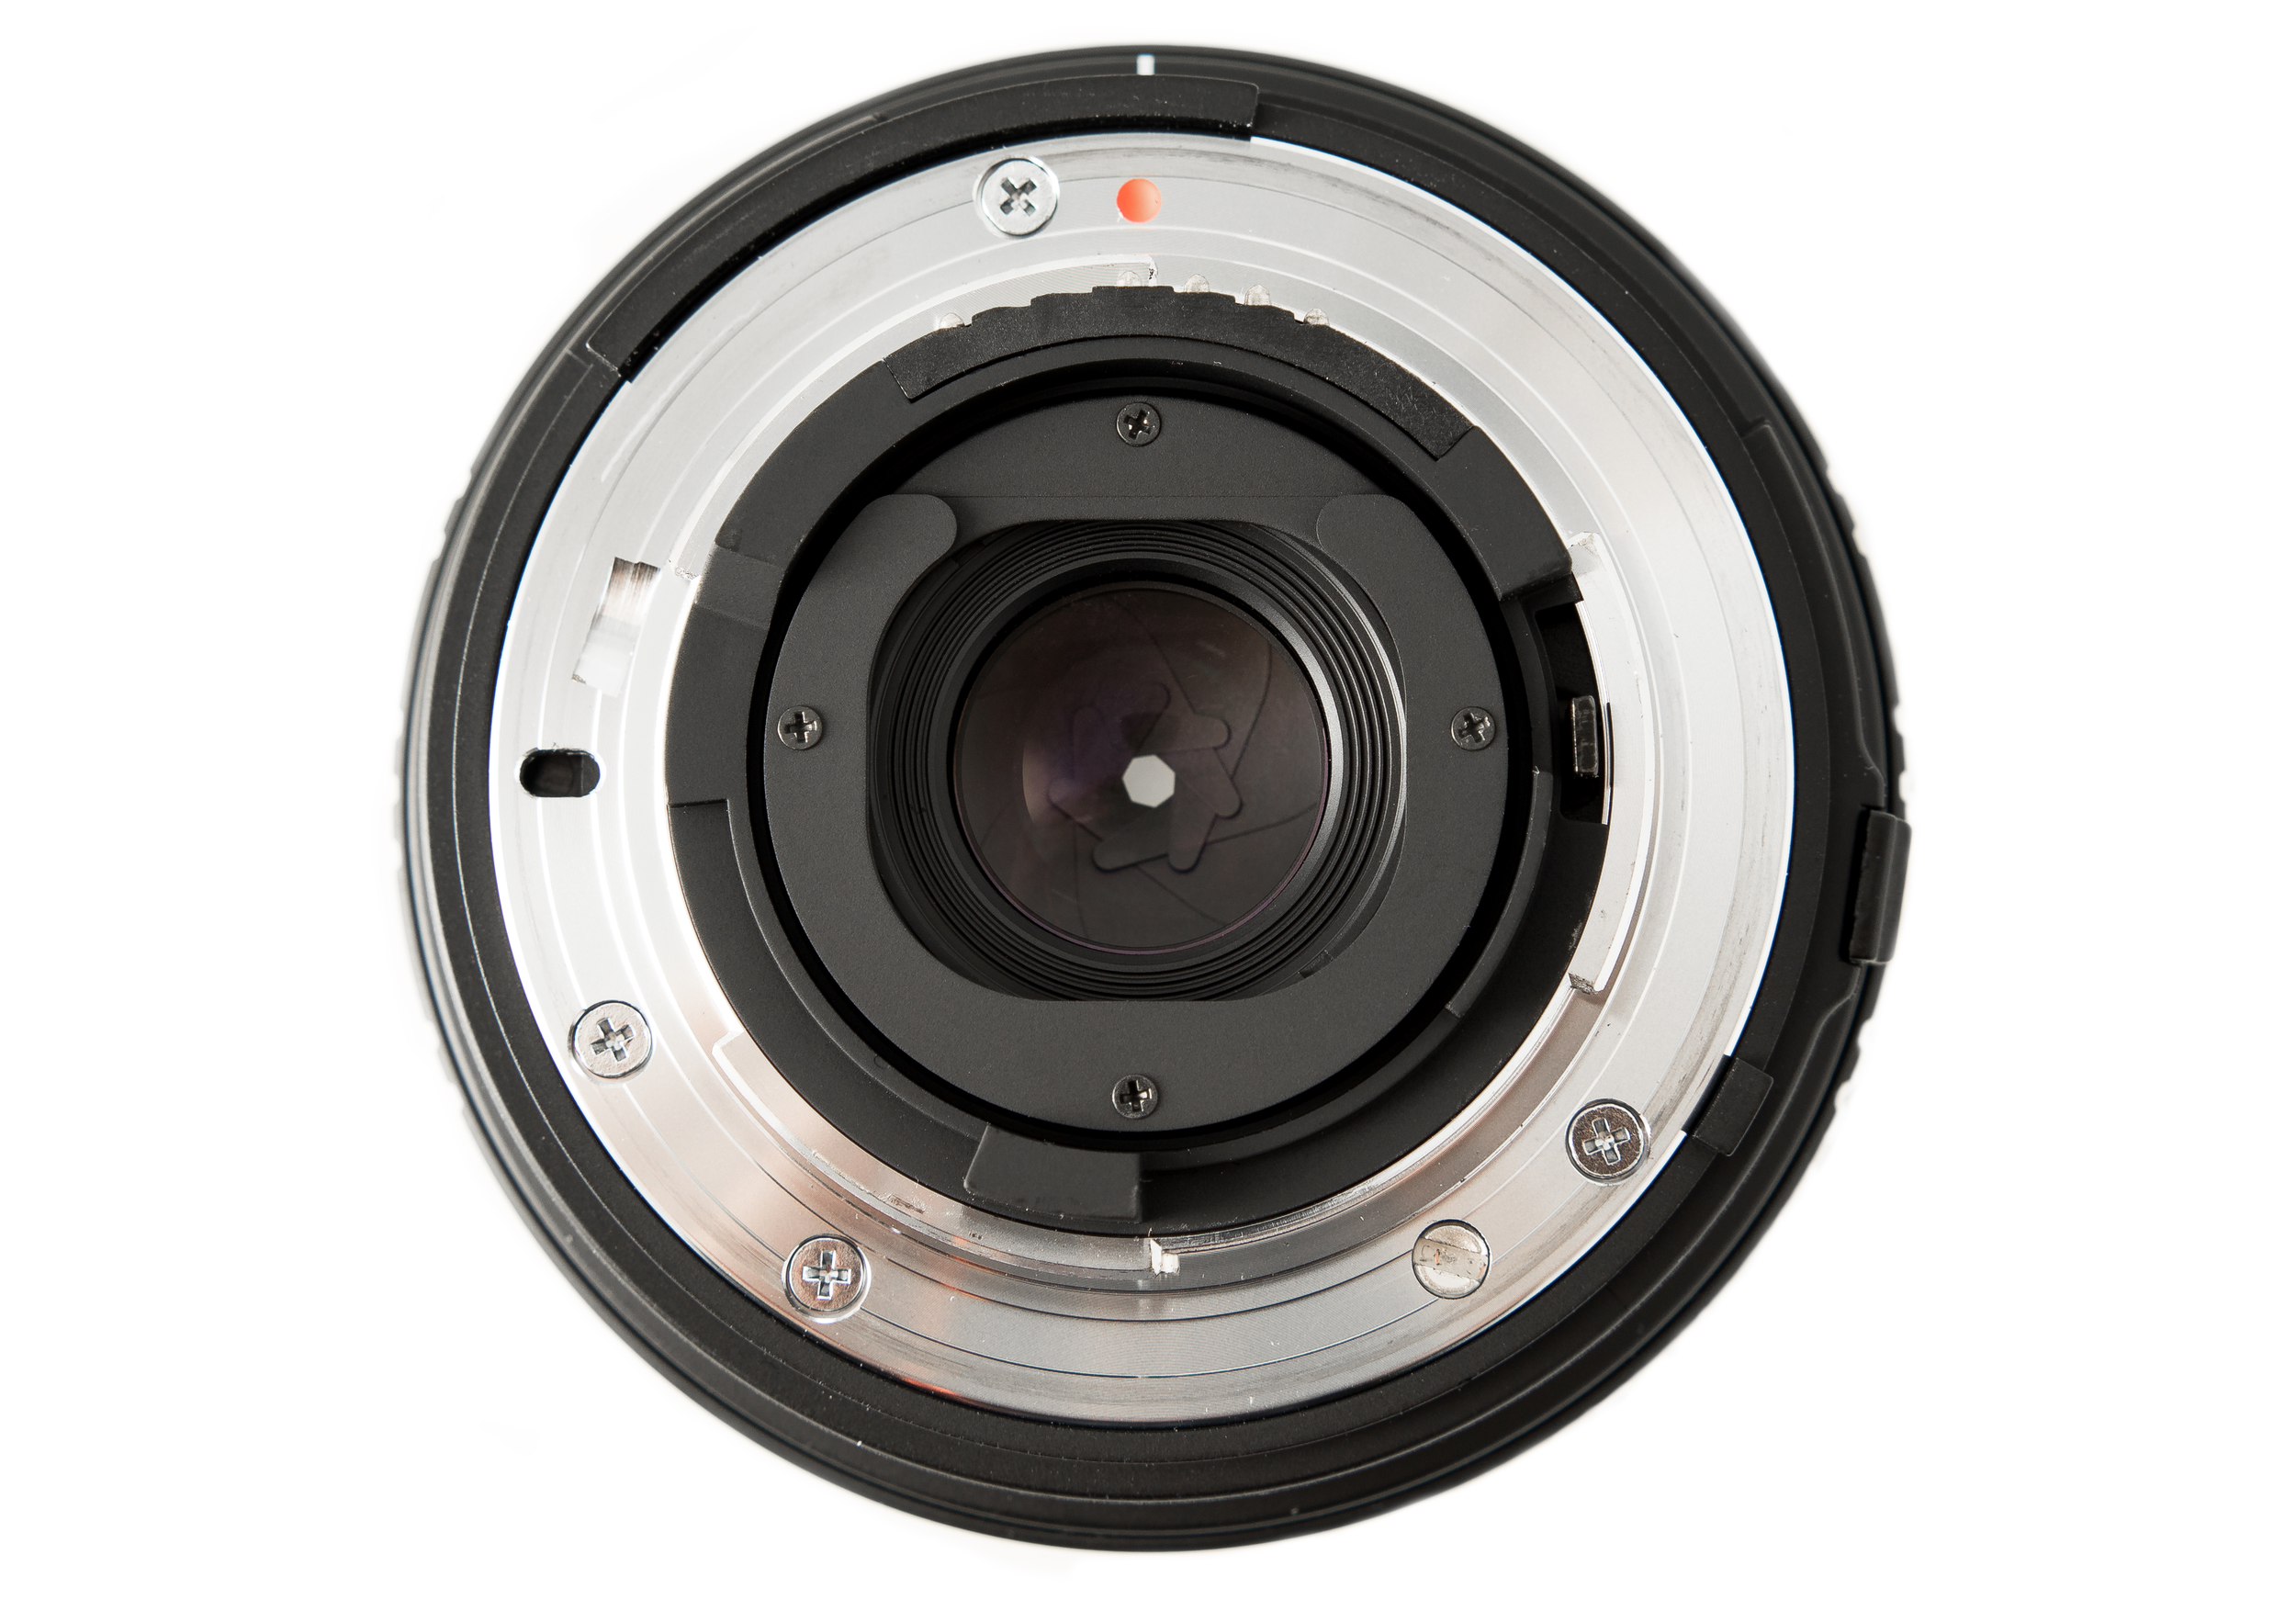 Drew Steven Photography Sigma 15mm f/2.8 Fisheye Review